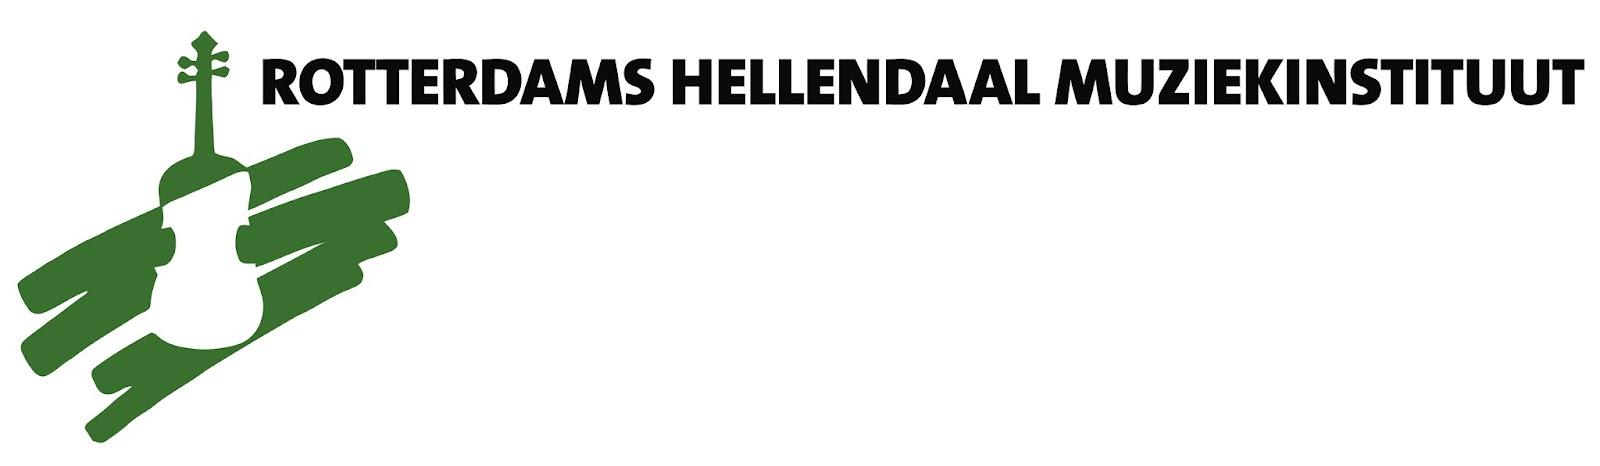 Hellendaal logo.jpg